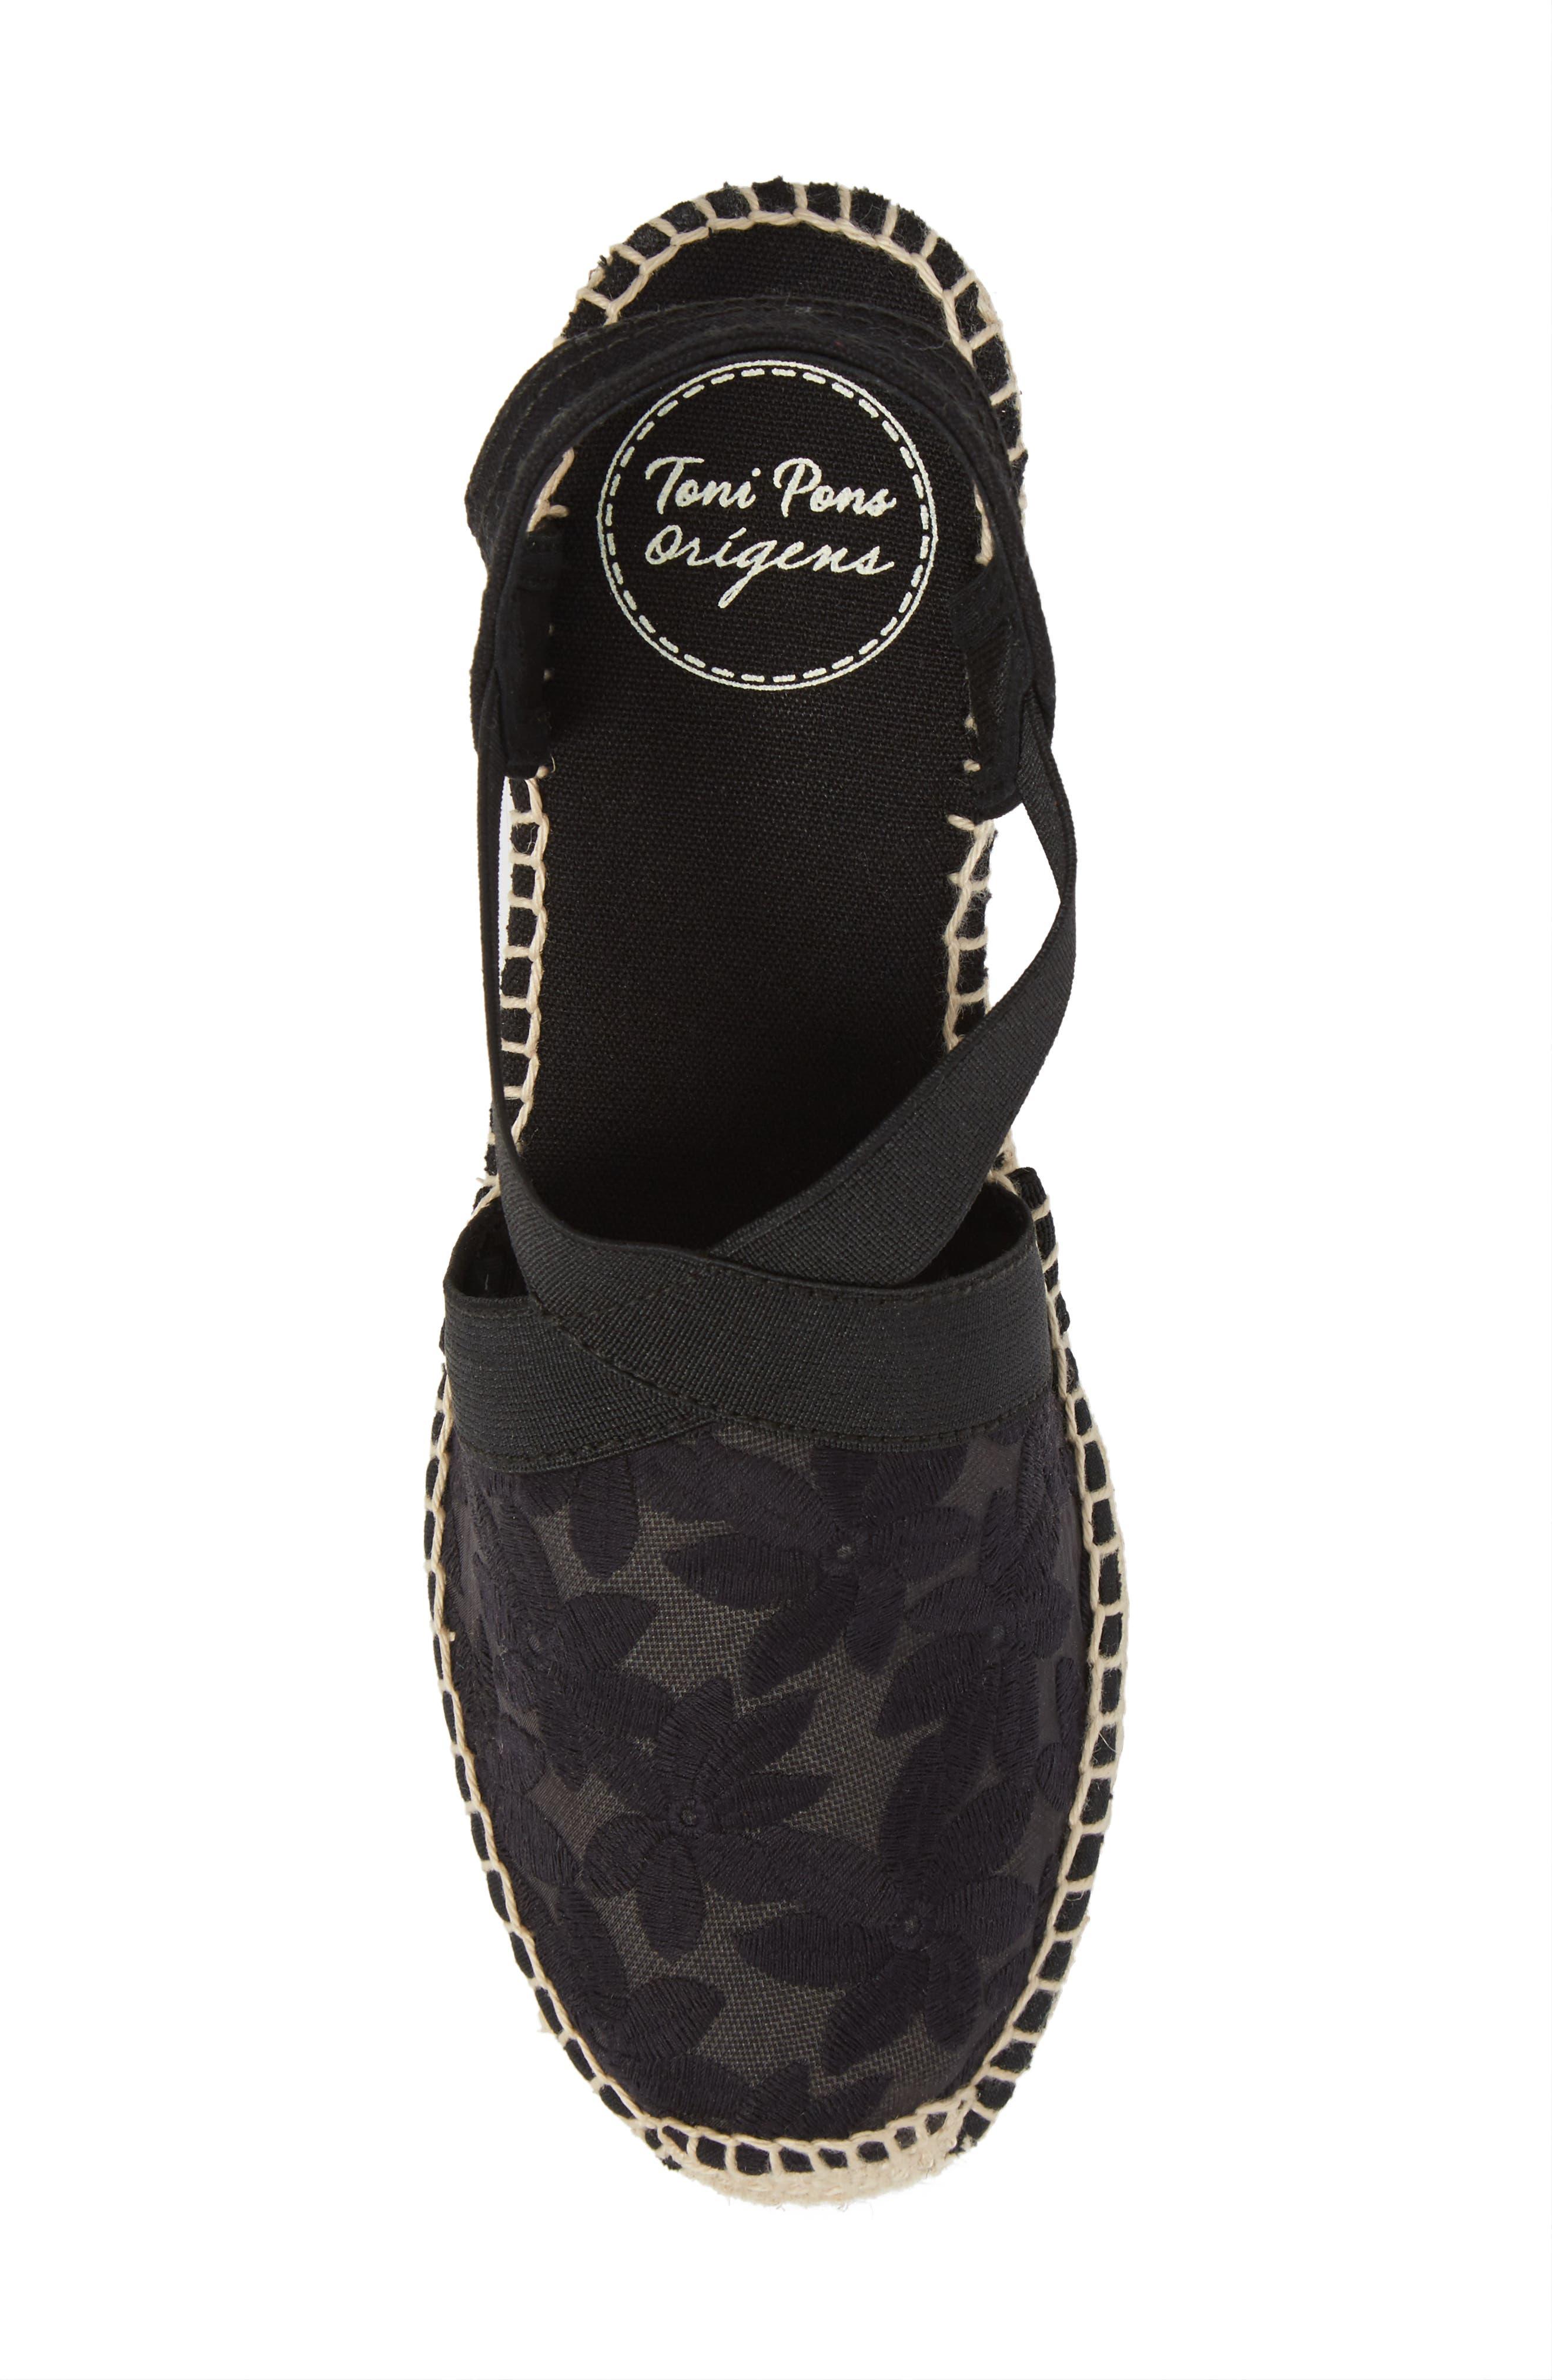 Terra Espadrille Wedge Sandal,                             Alternate thumbnail 5, color,                             Black Fabric